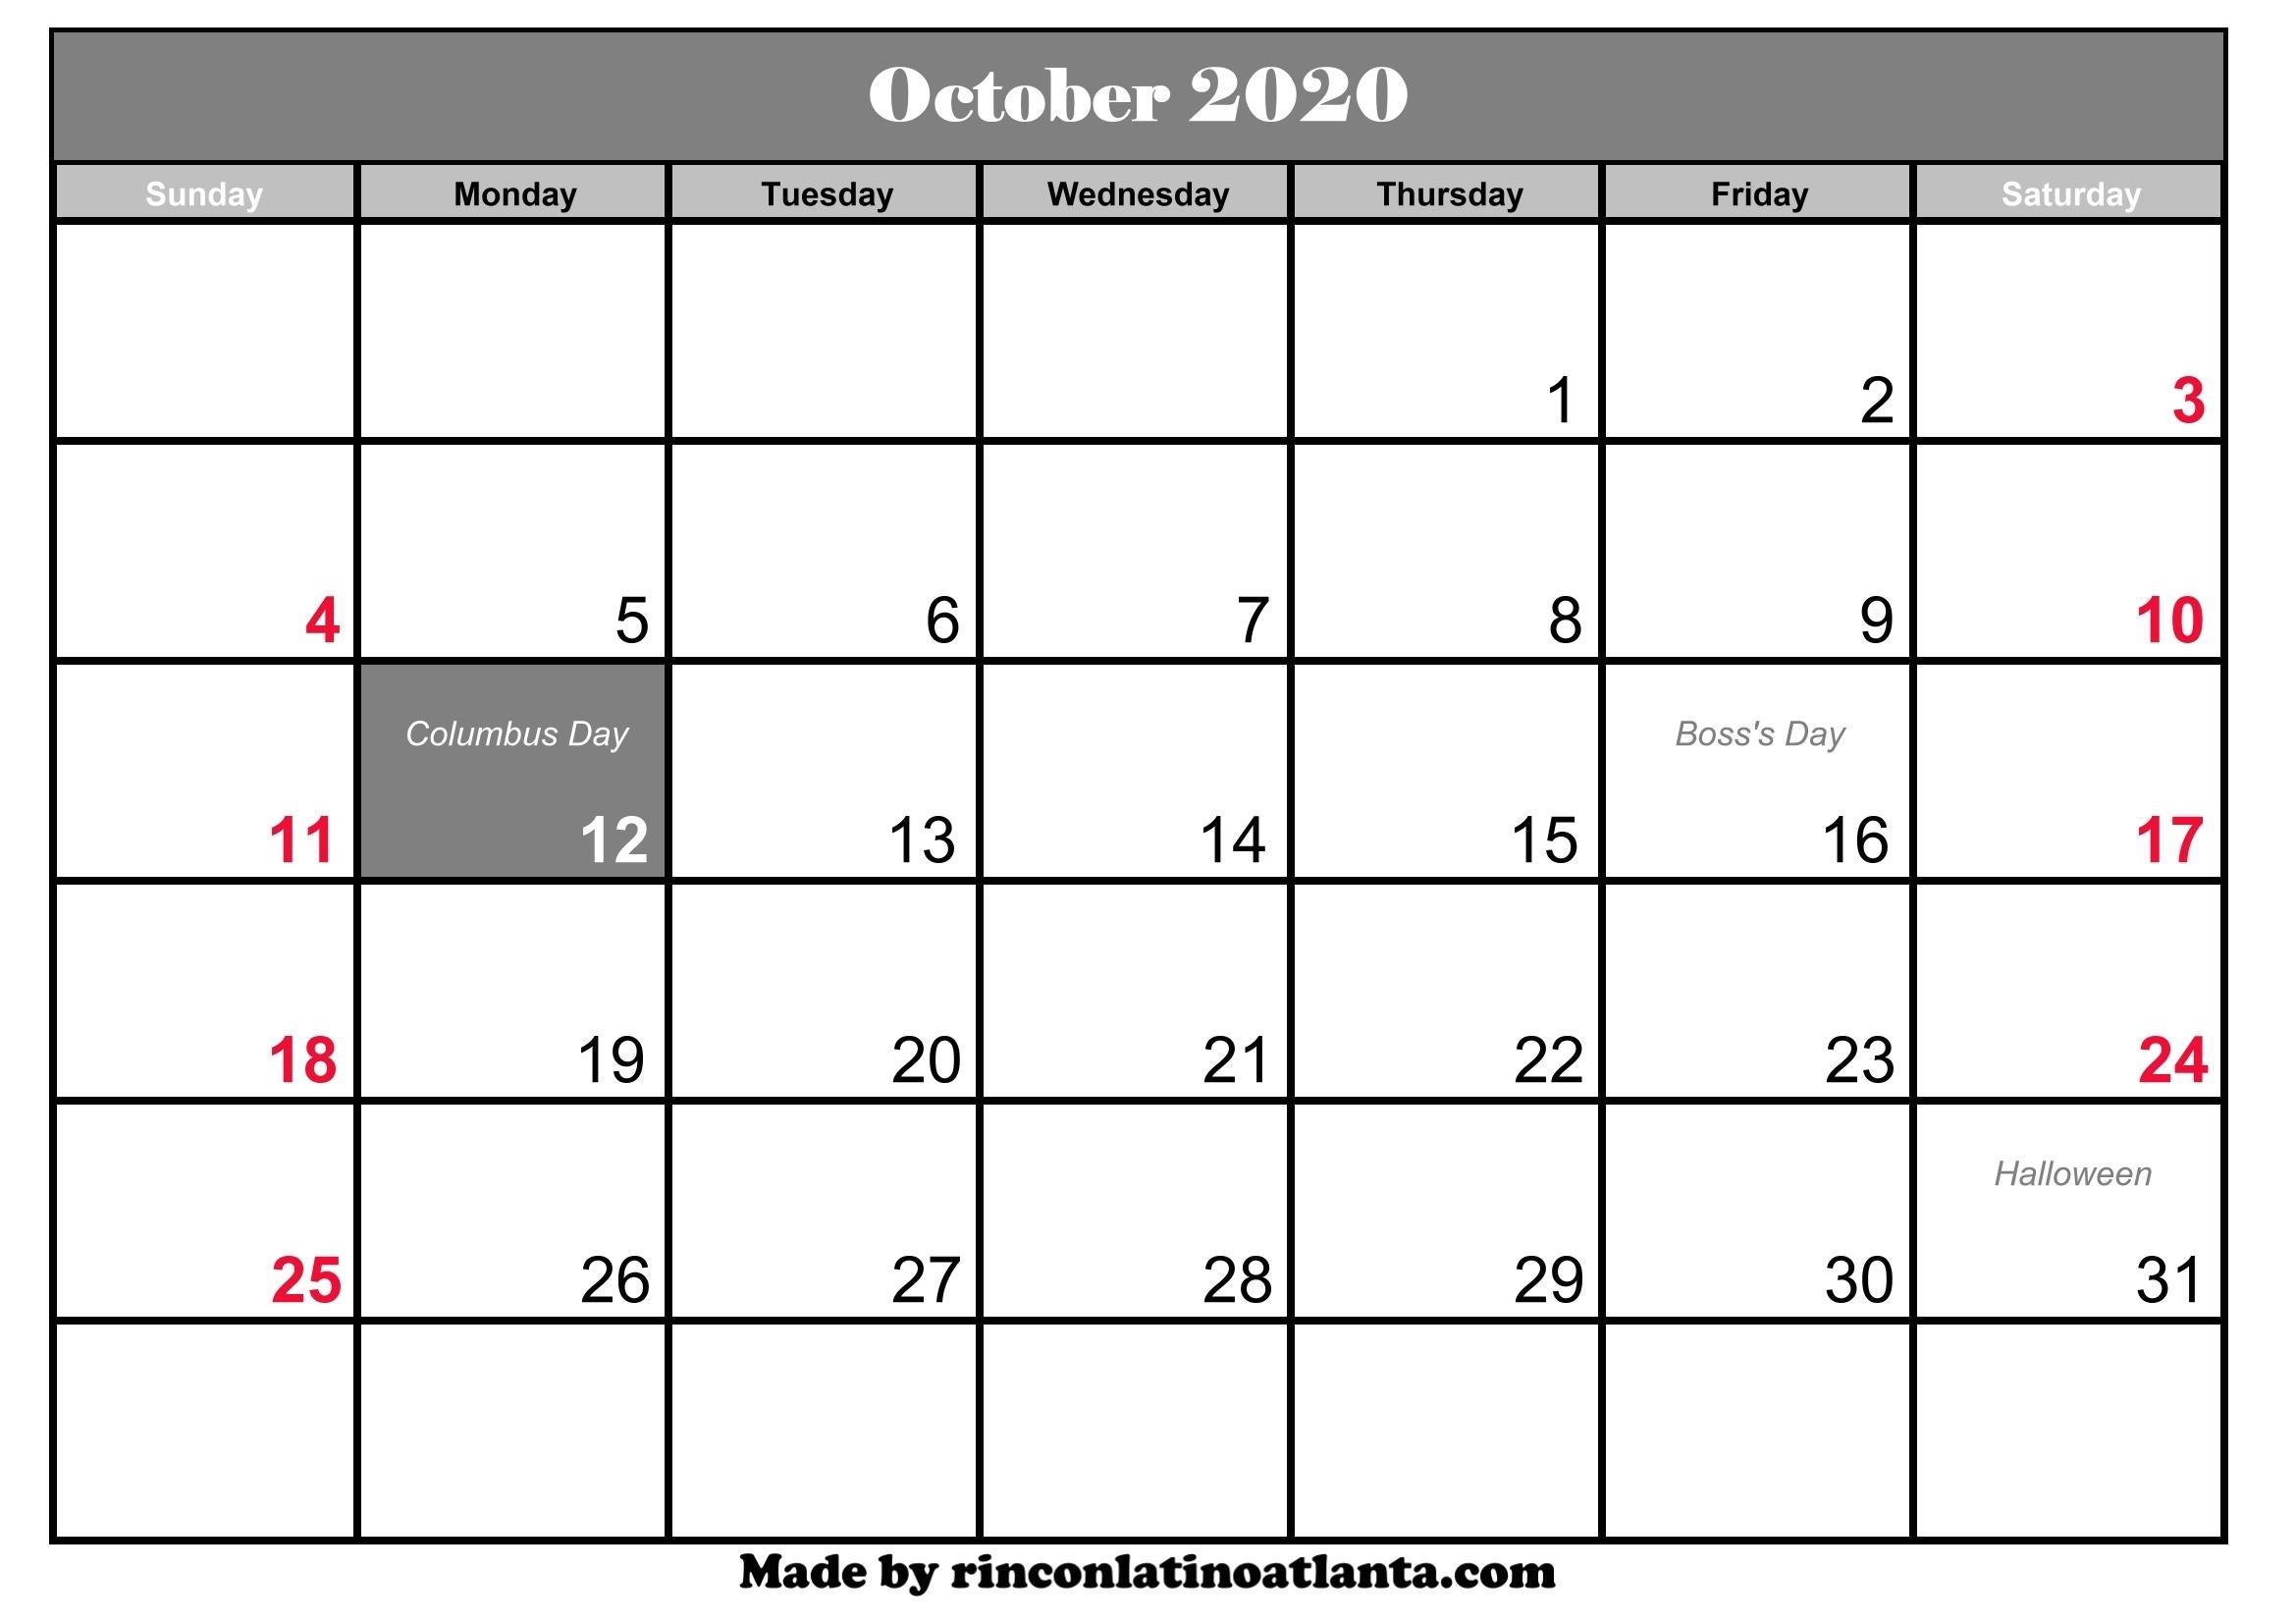 October 2020 Calendar Printable With Holidays | Calendar